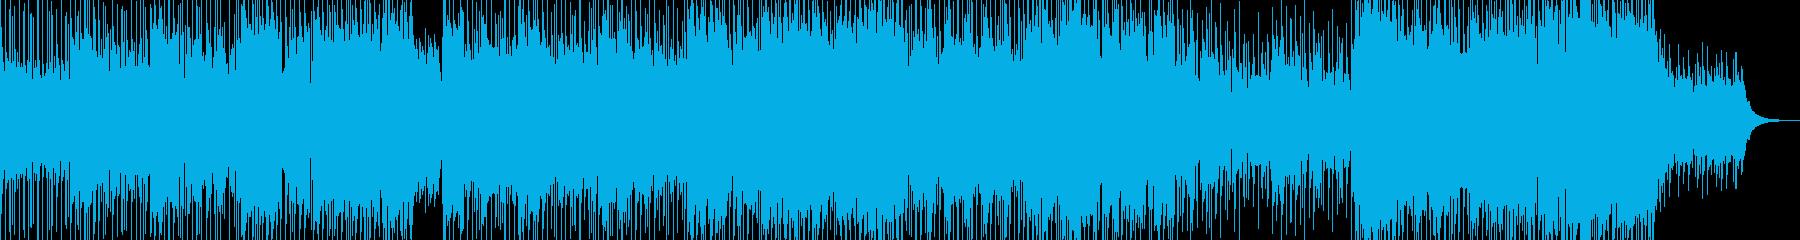 Smokeの再生済みの波形